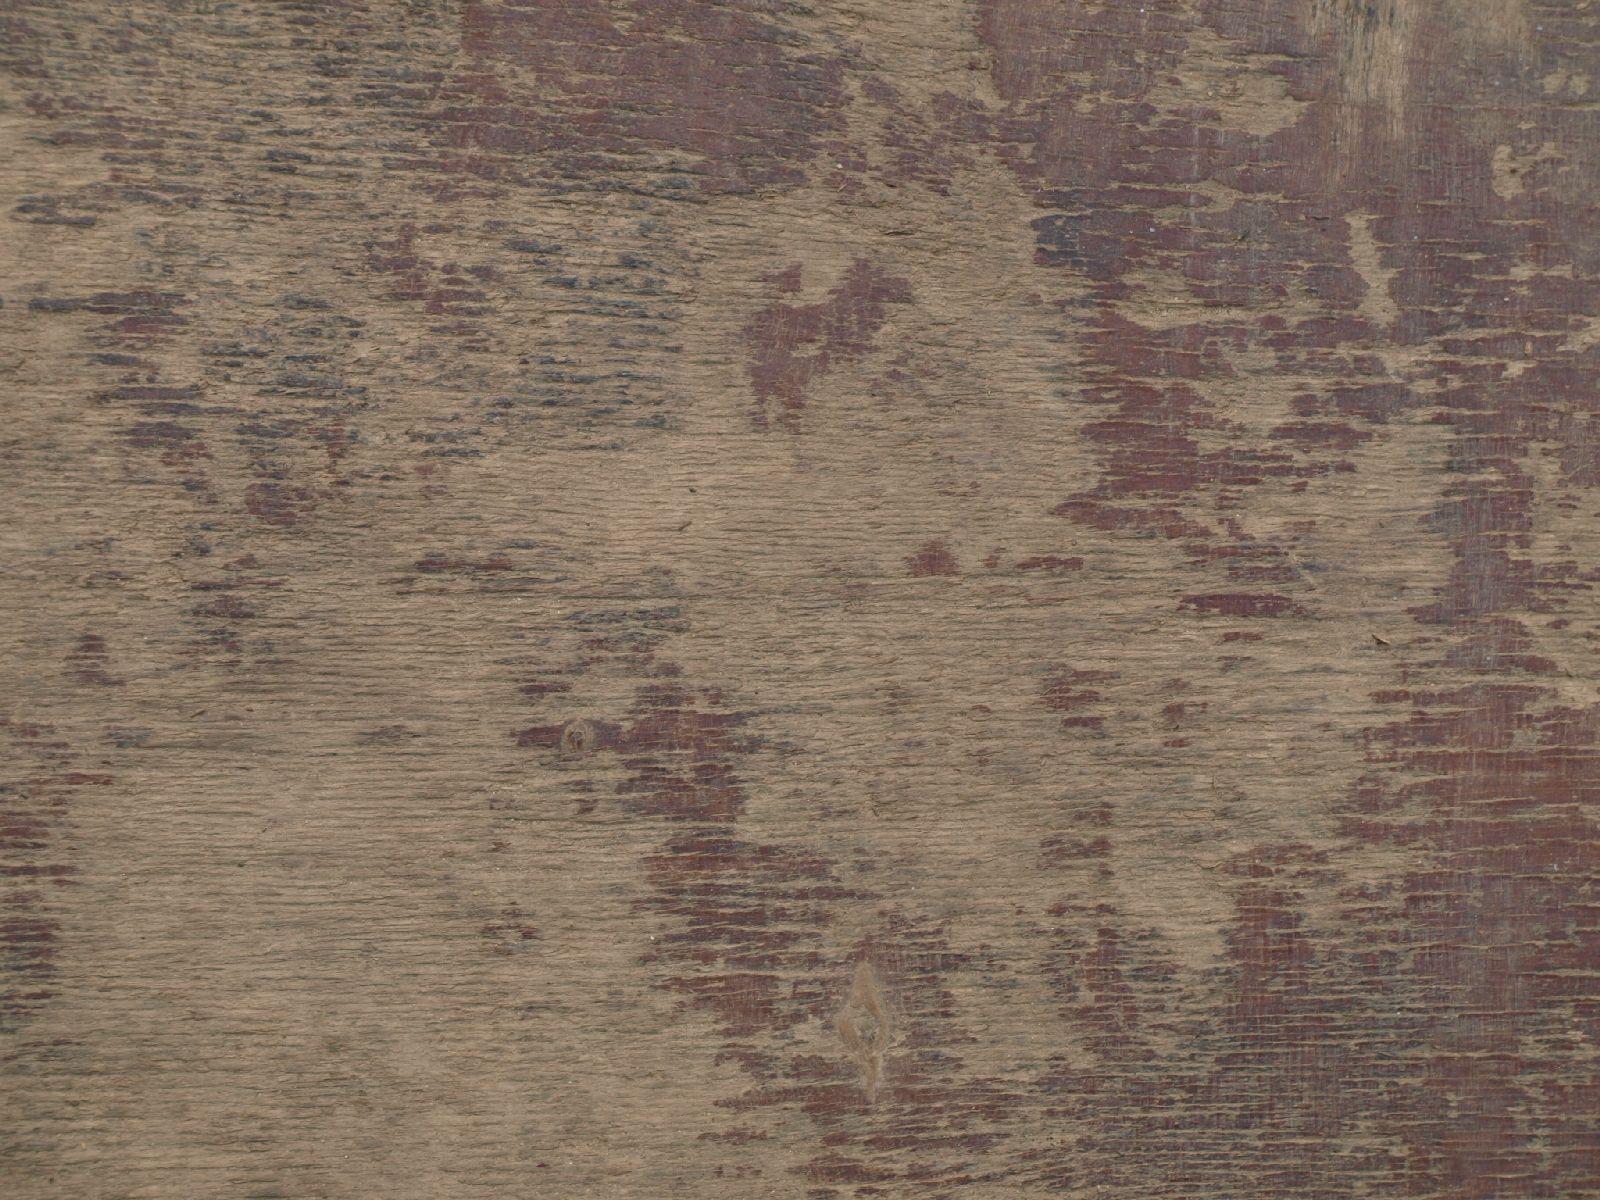 Wood_Texture_A_P9129631